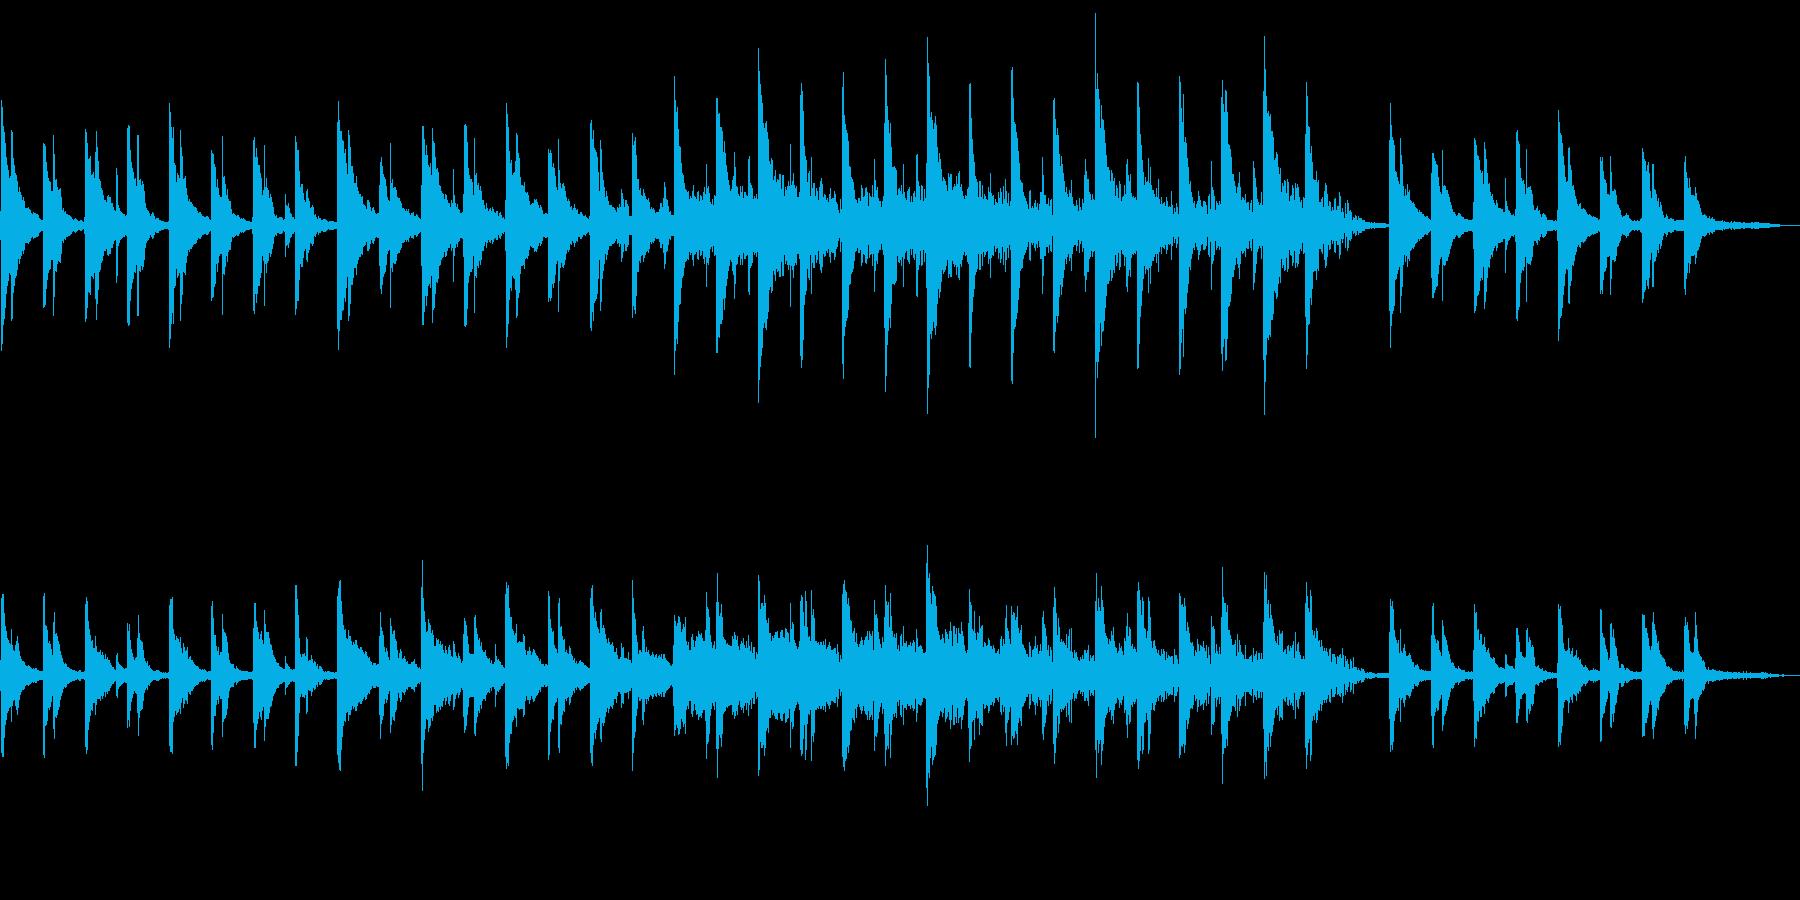 SIZUKUの再生済みの波形